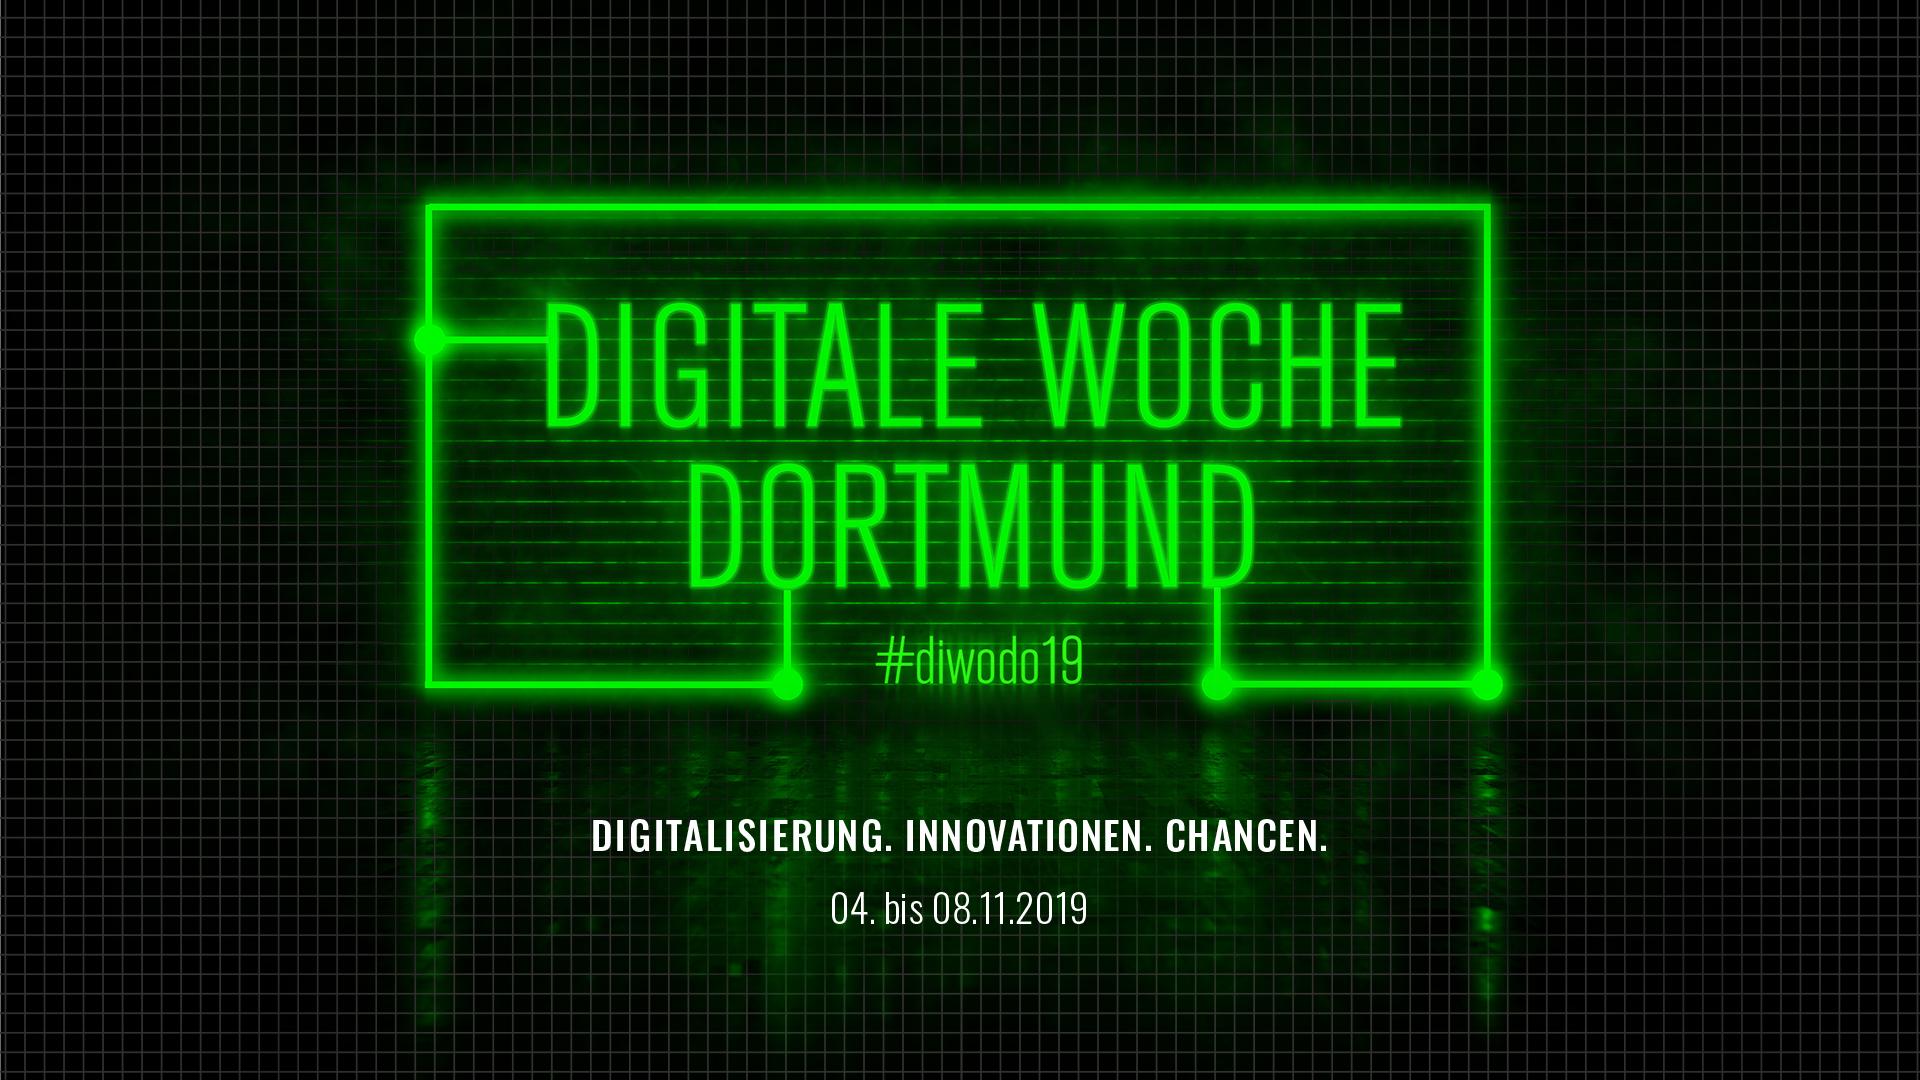 Logo Digitale Woche Dortmund 2019